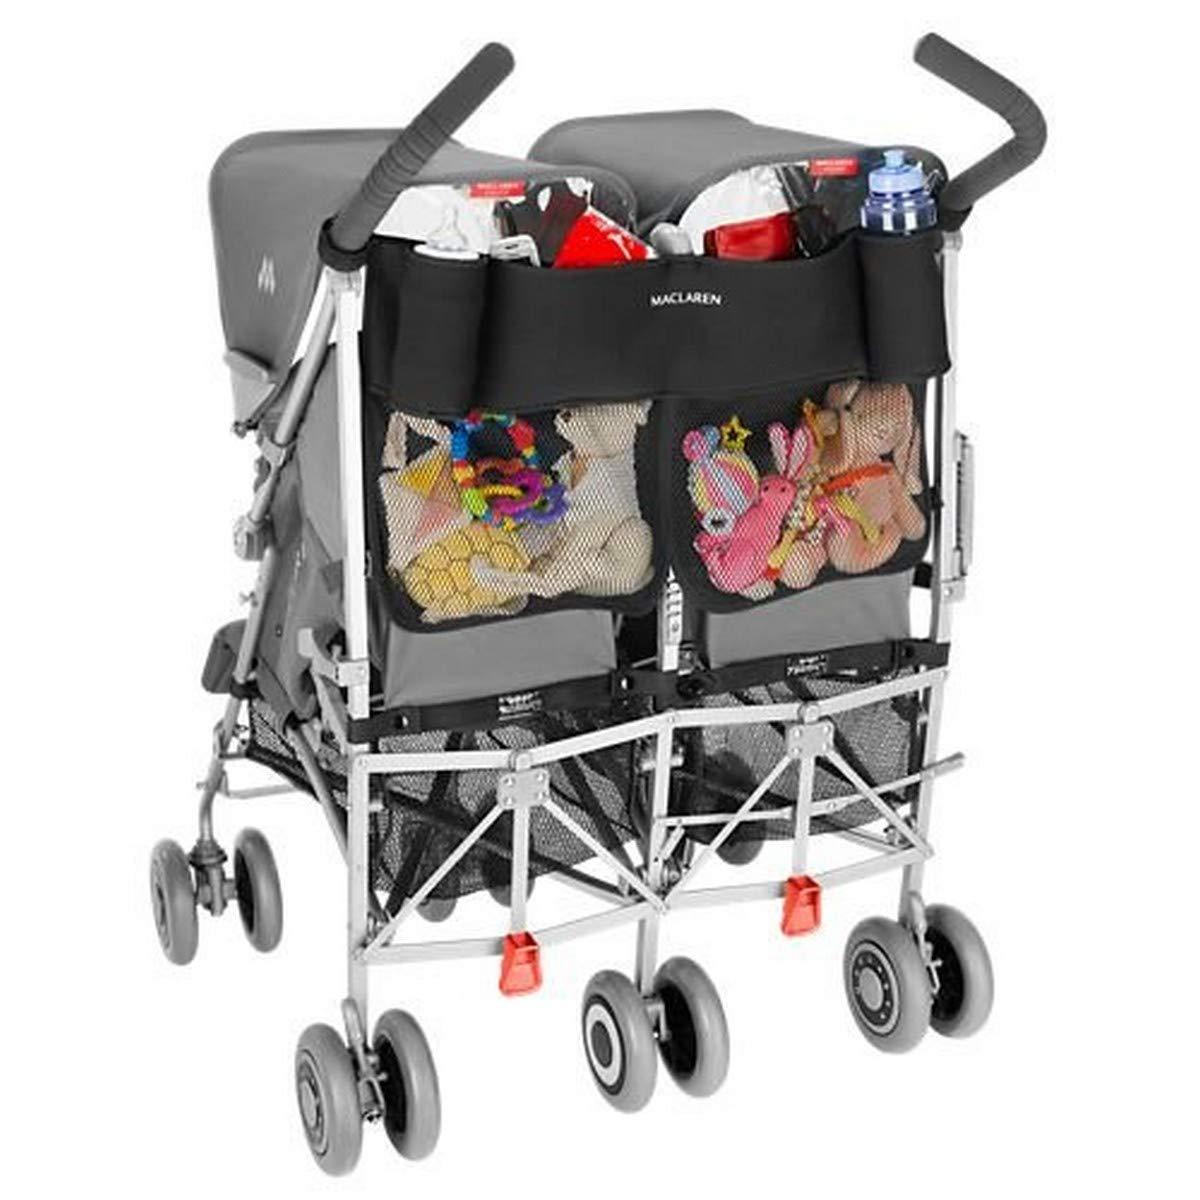 Maclaren Universal Twin Buggy Organizer